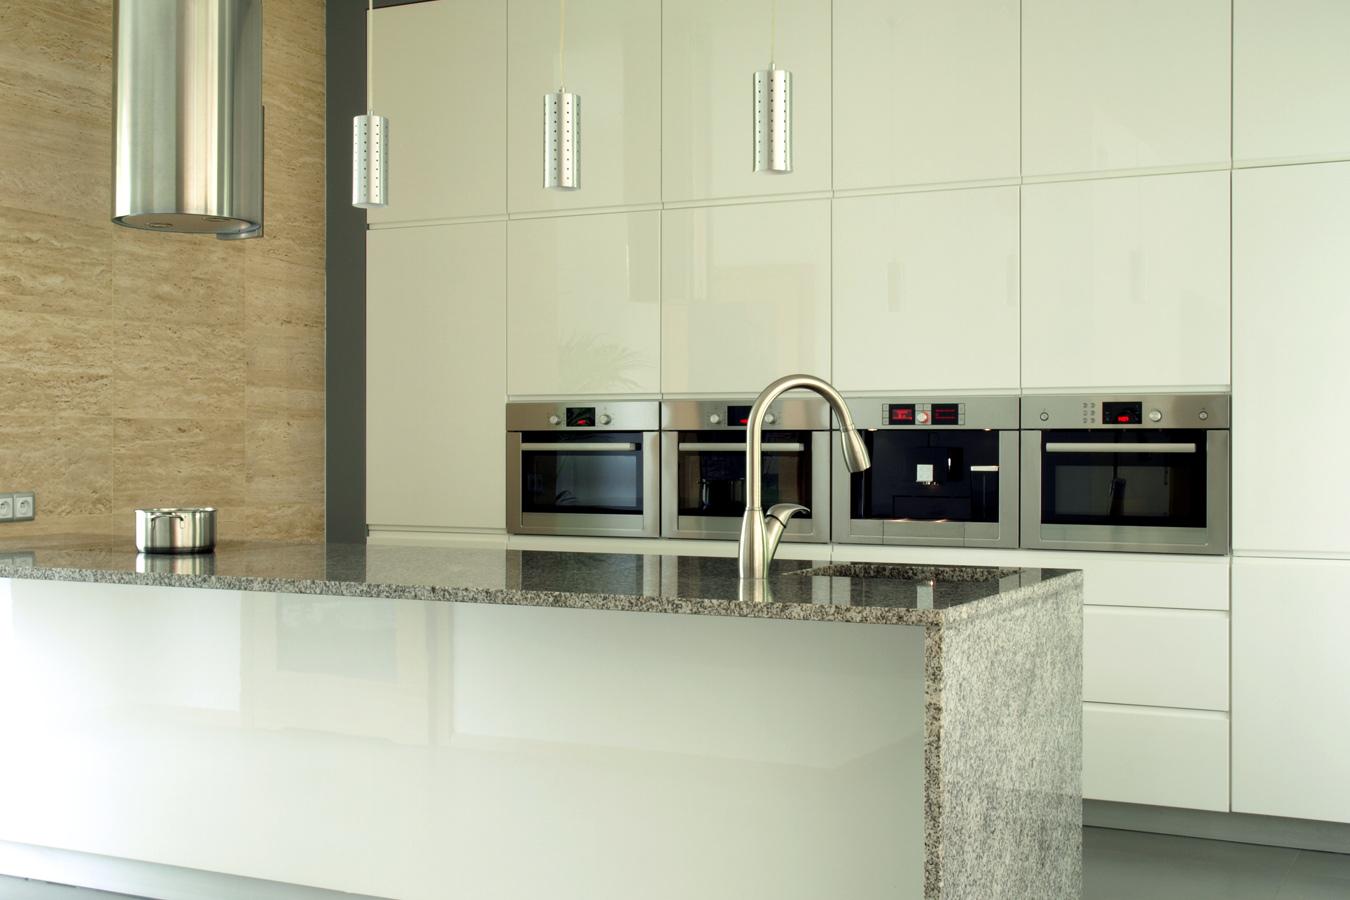 Moderne keukens idee n inspiratie for Moderne keuken ideeen